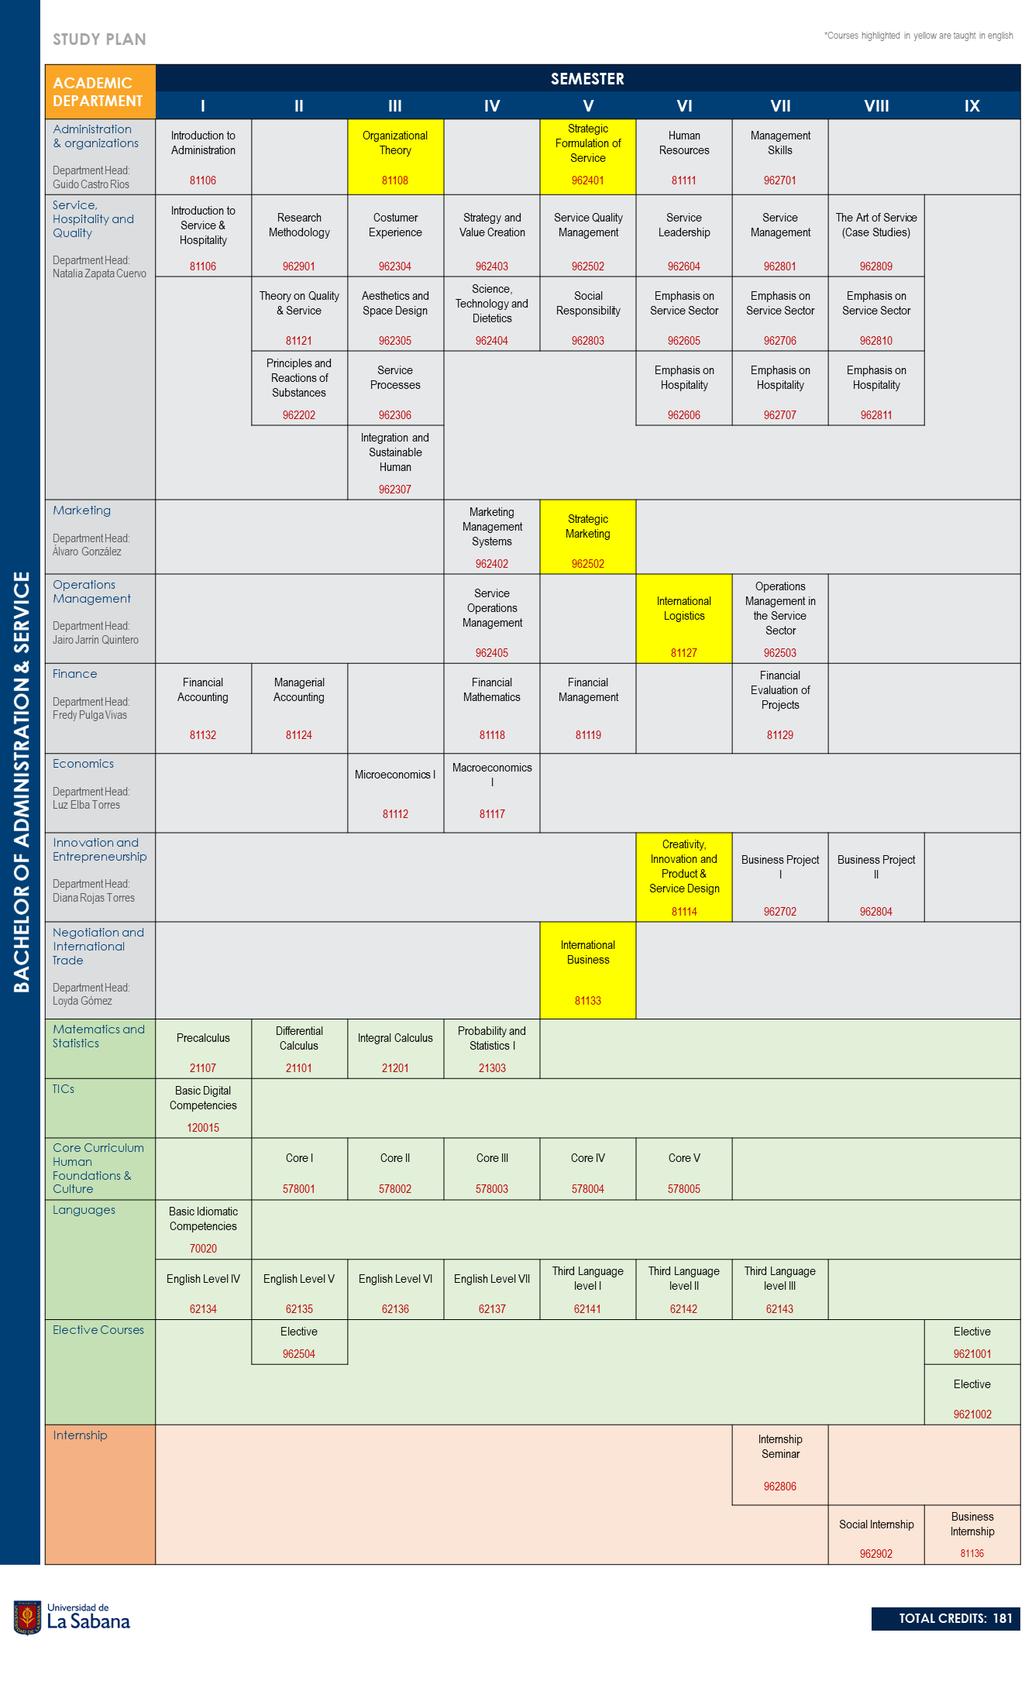 study-plan-administration-service-eicea-unisabana-2018